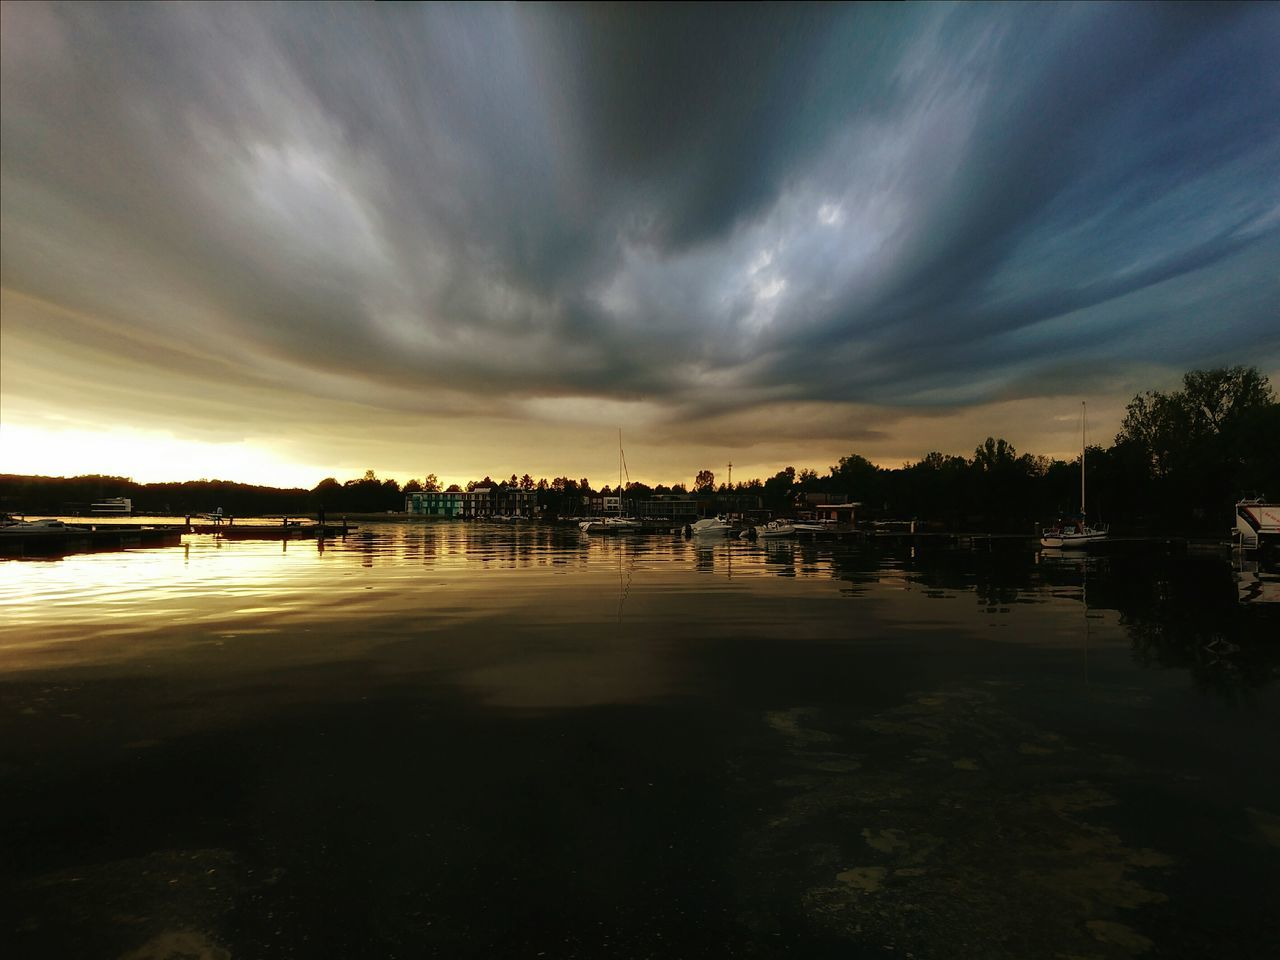 Reflection Lake Water Cloud - Sky Outdoors Vacations No People Beach Sunset Nature Sky Tree Olsztyn Warmia Mazury Polska Poland Ukiel Jezioro